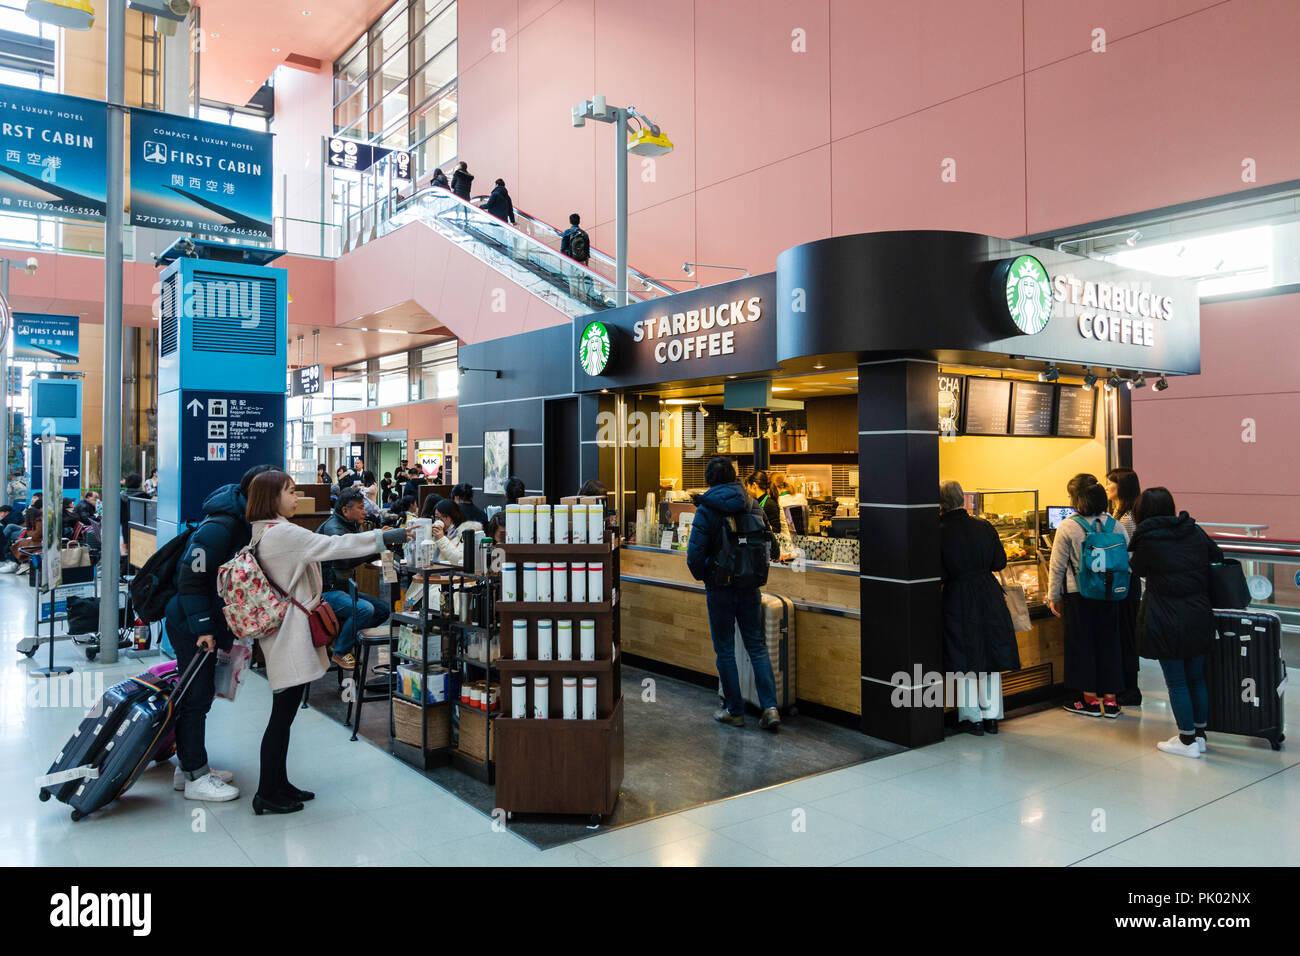 Starbucks Airport Stock Photos & Starbucks Airport Stock Images - Alamy